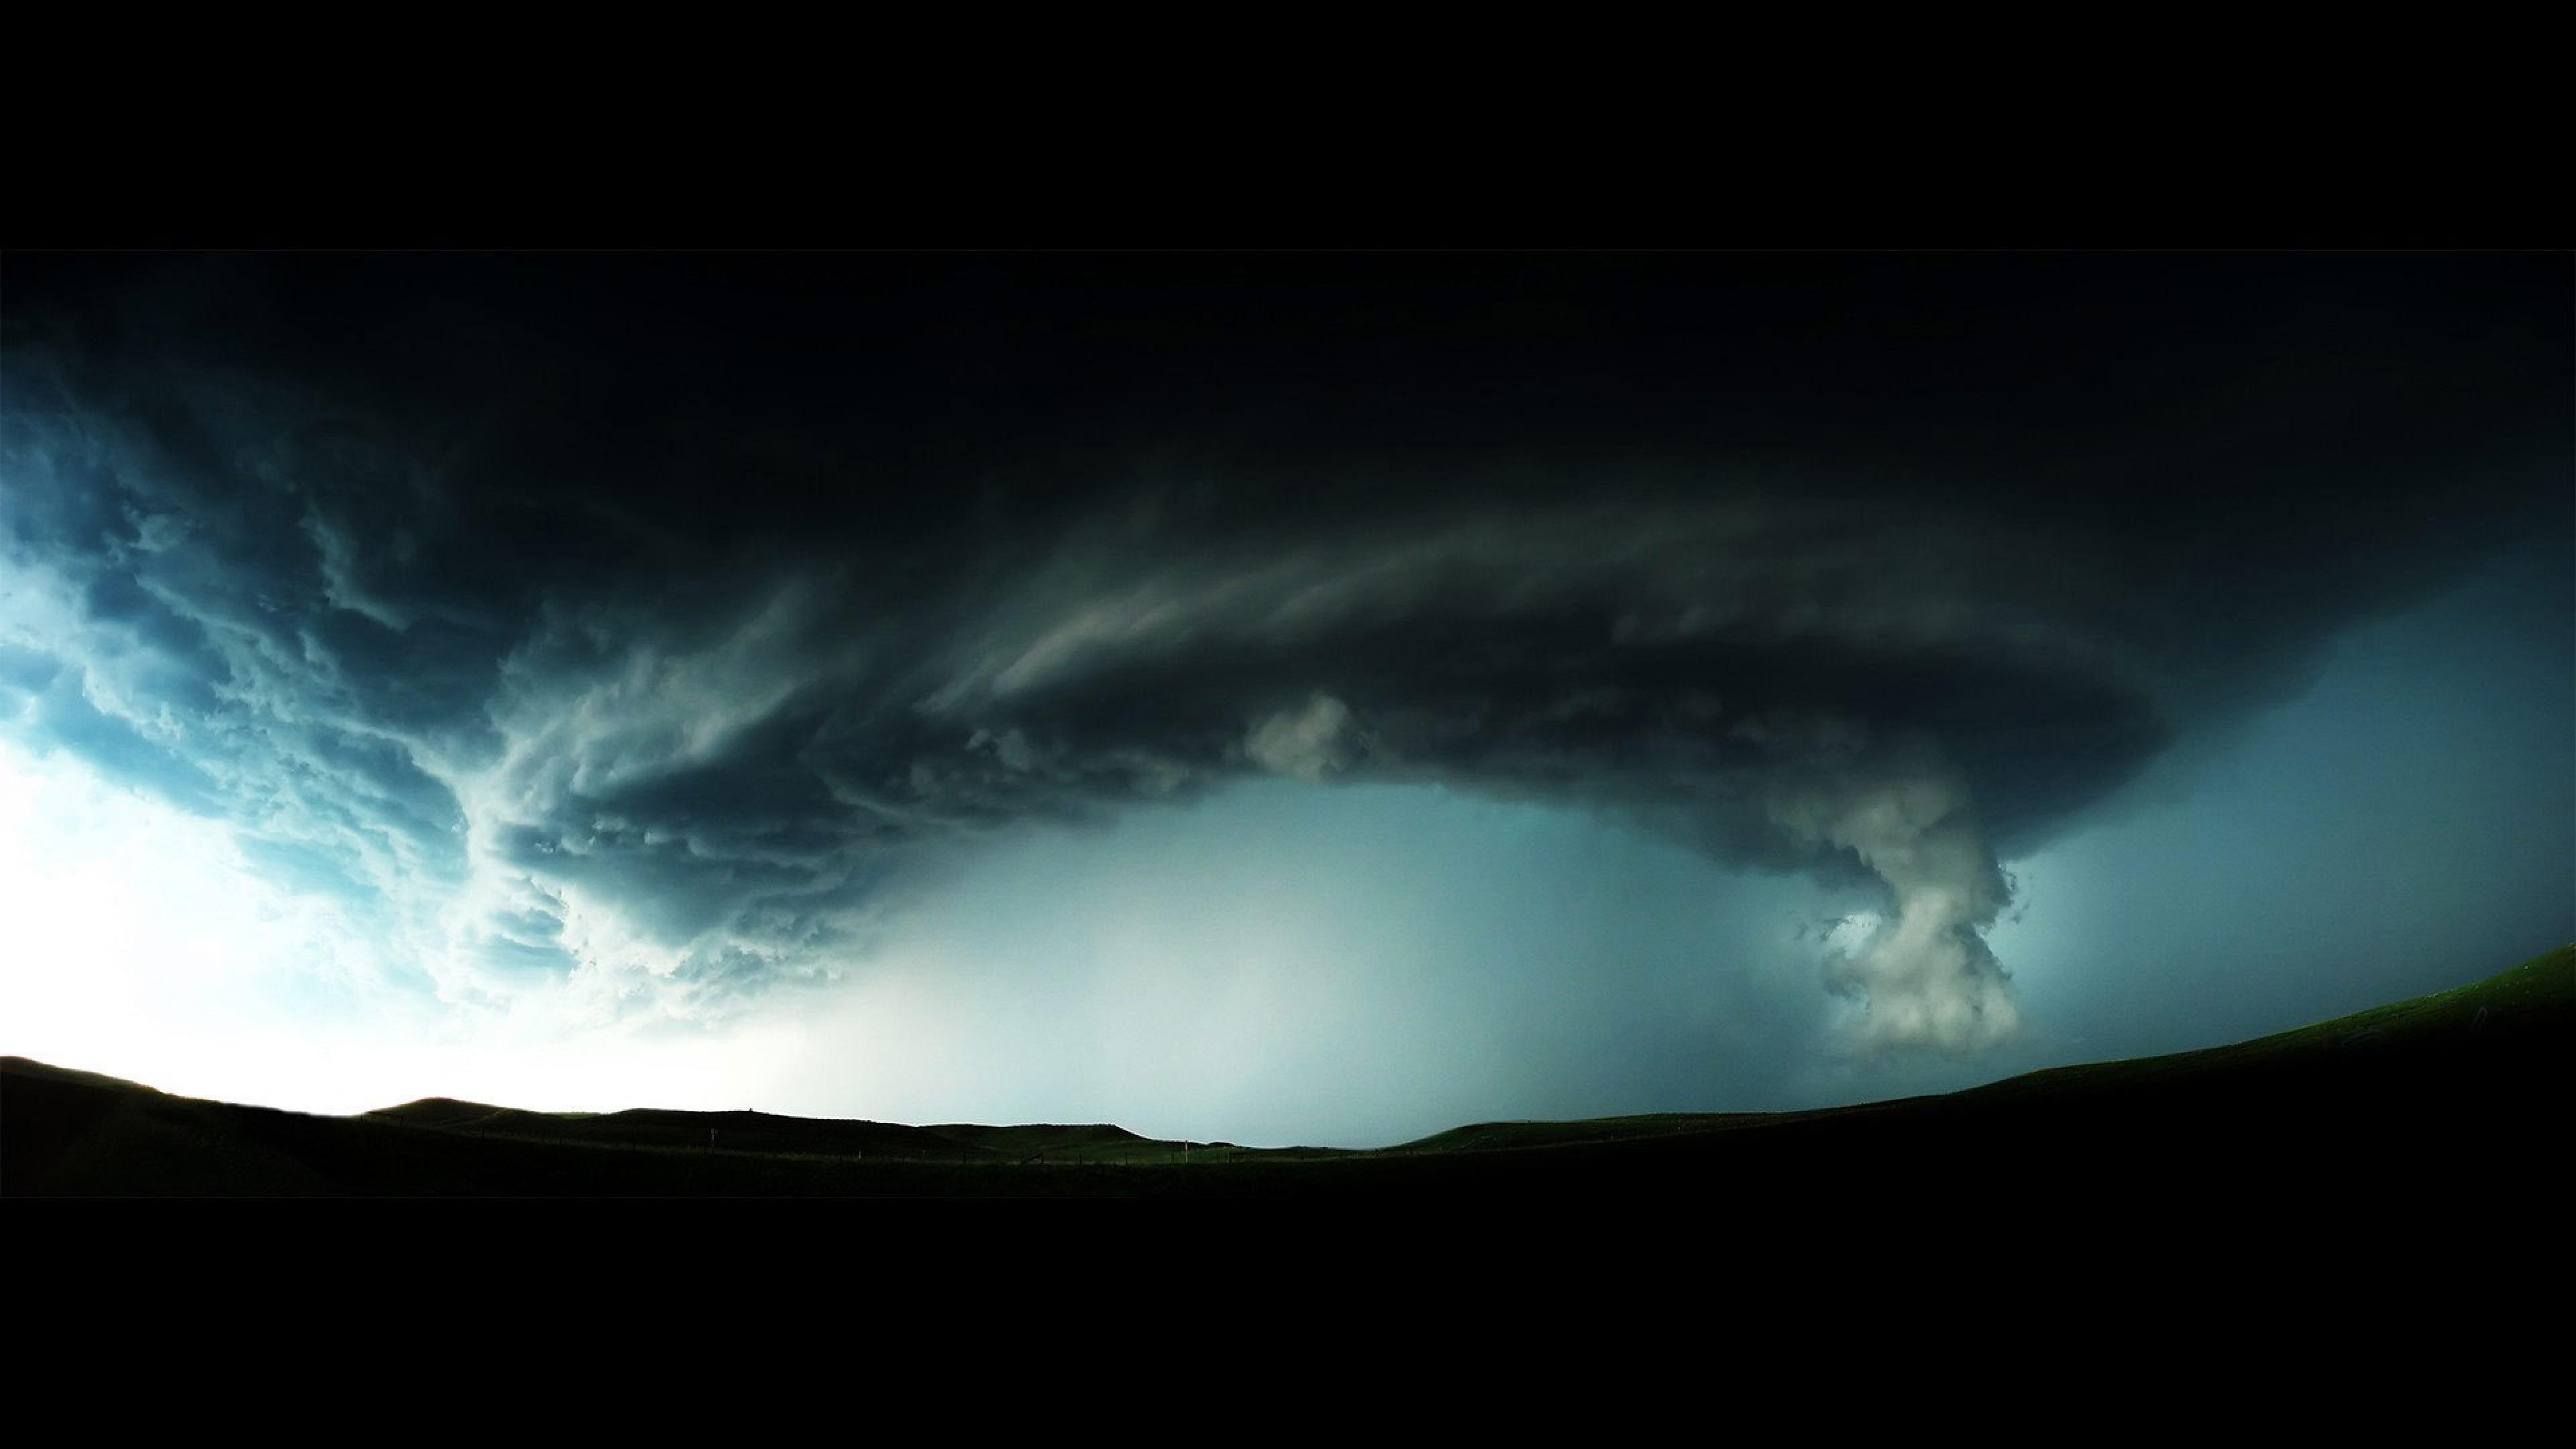 disaster Danger Dark Storm Wallpaper Background 4K Ultra HD 3840x2160